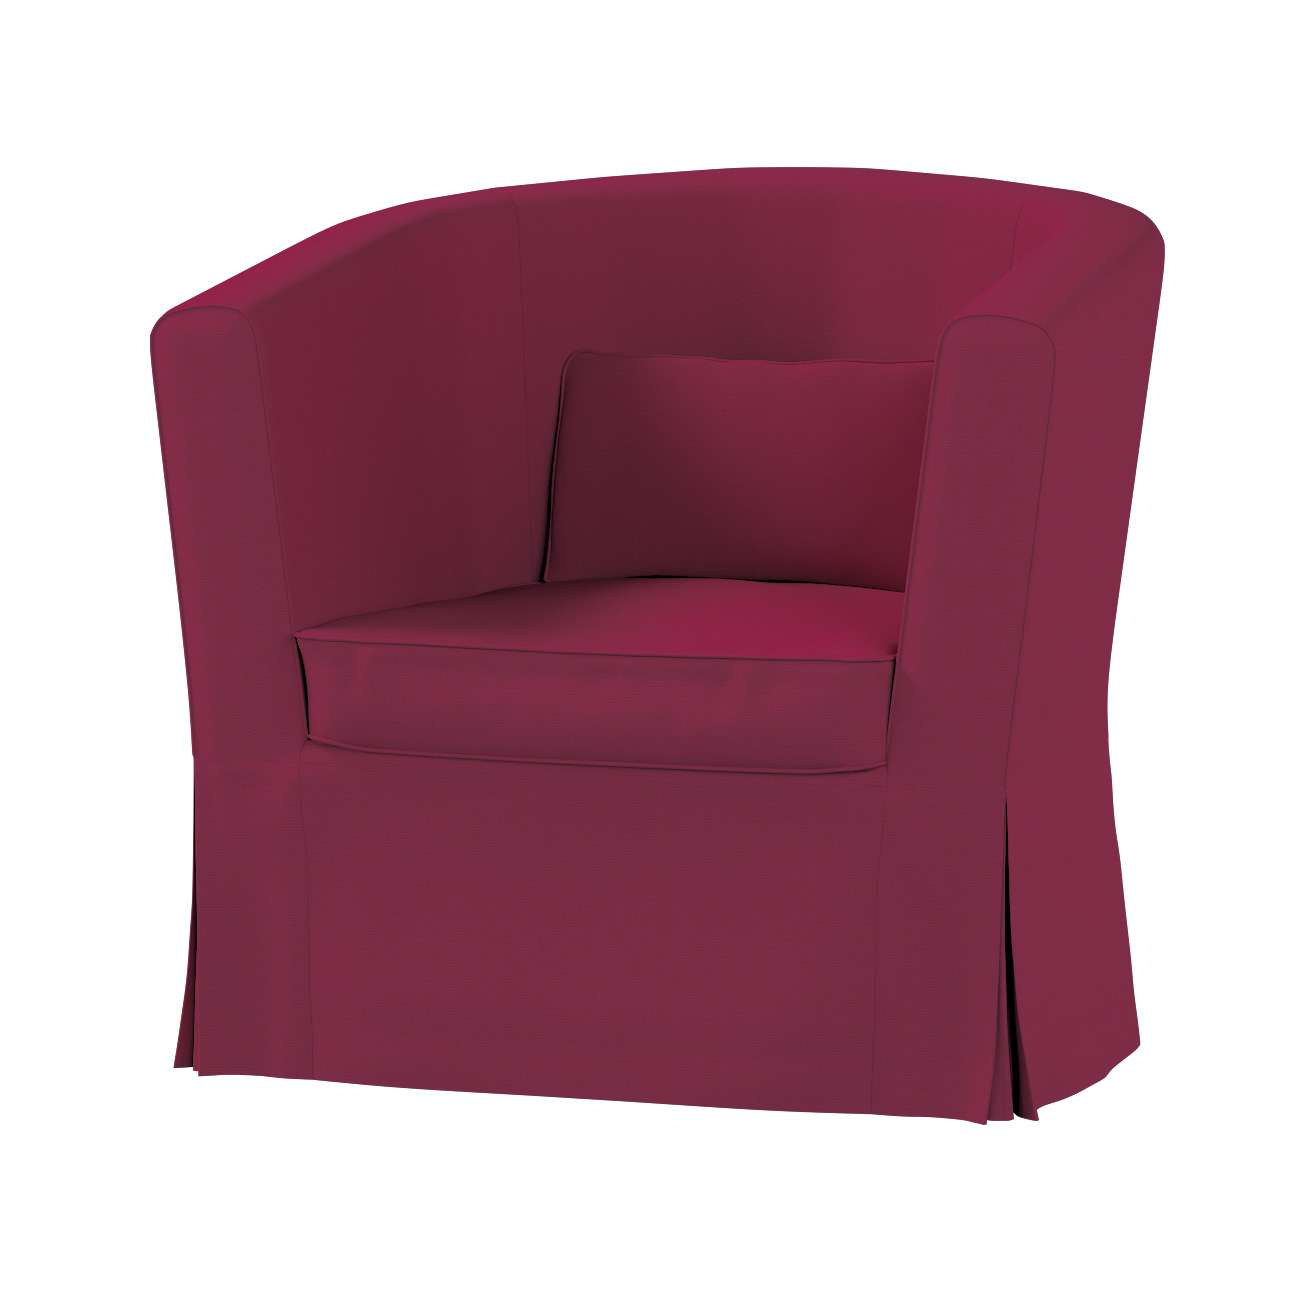 Ektorp Tullsta Sesselbezug Sesselhusse, Ektorp Tullsta von der Kollektion Cotton Panama, Stoff: 702-32